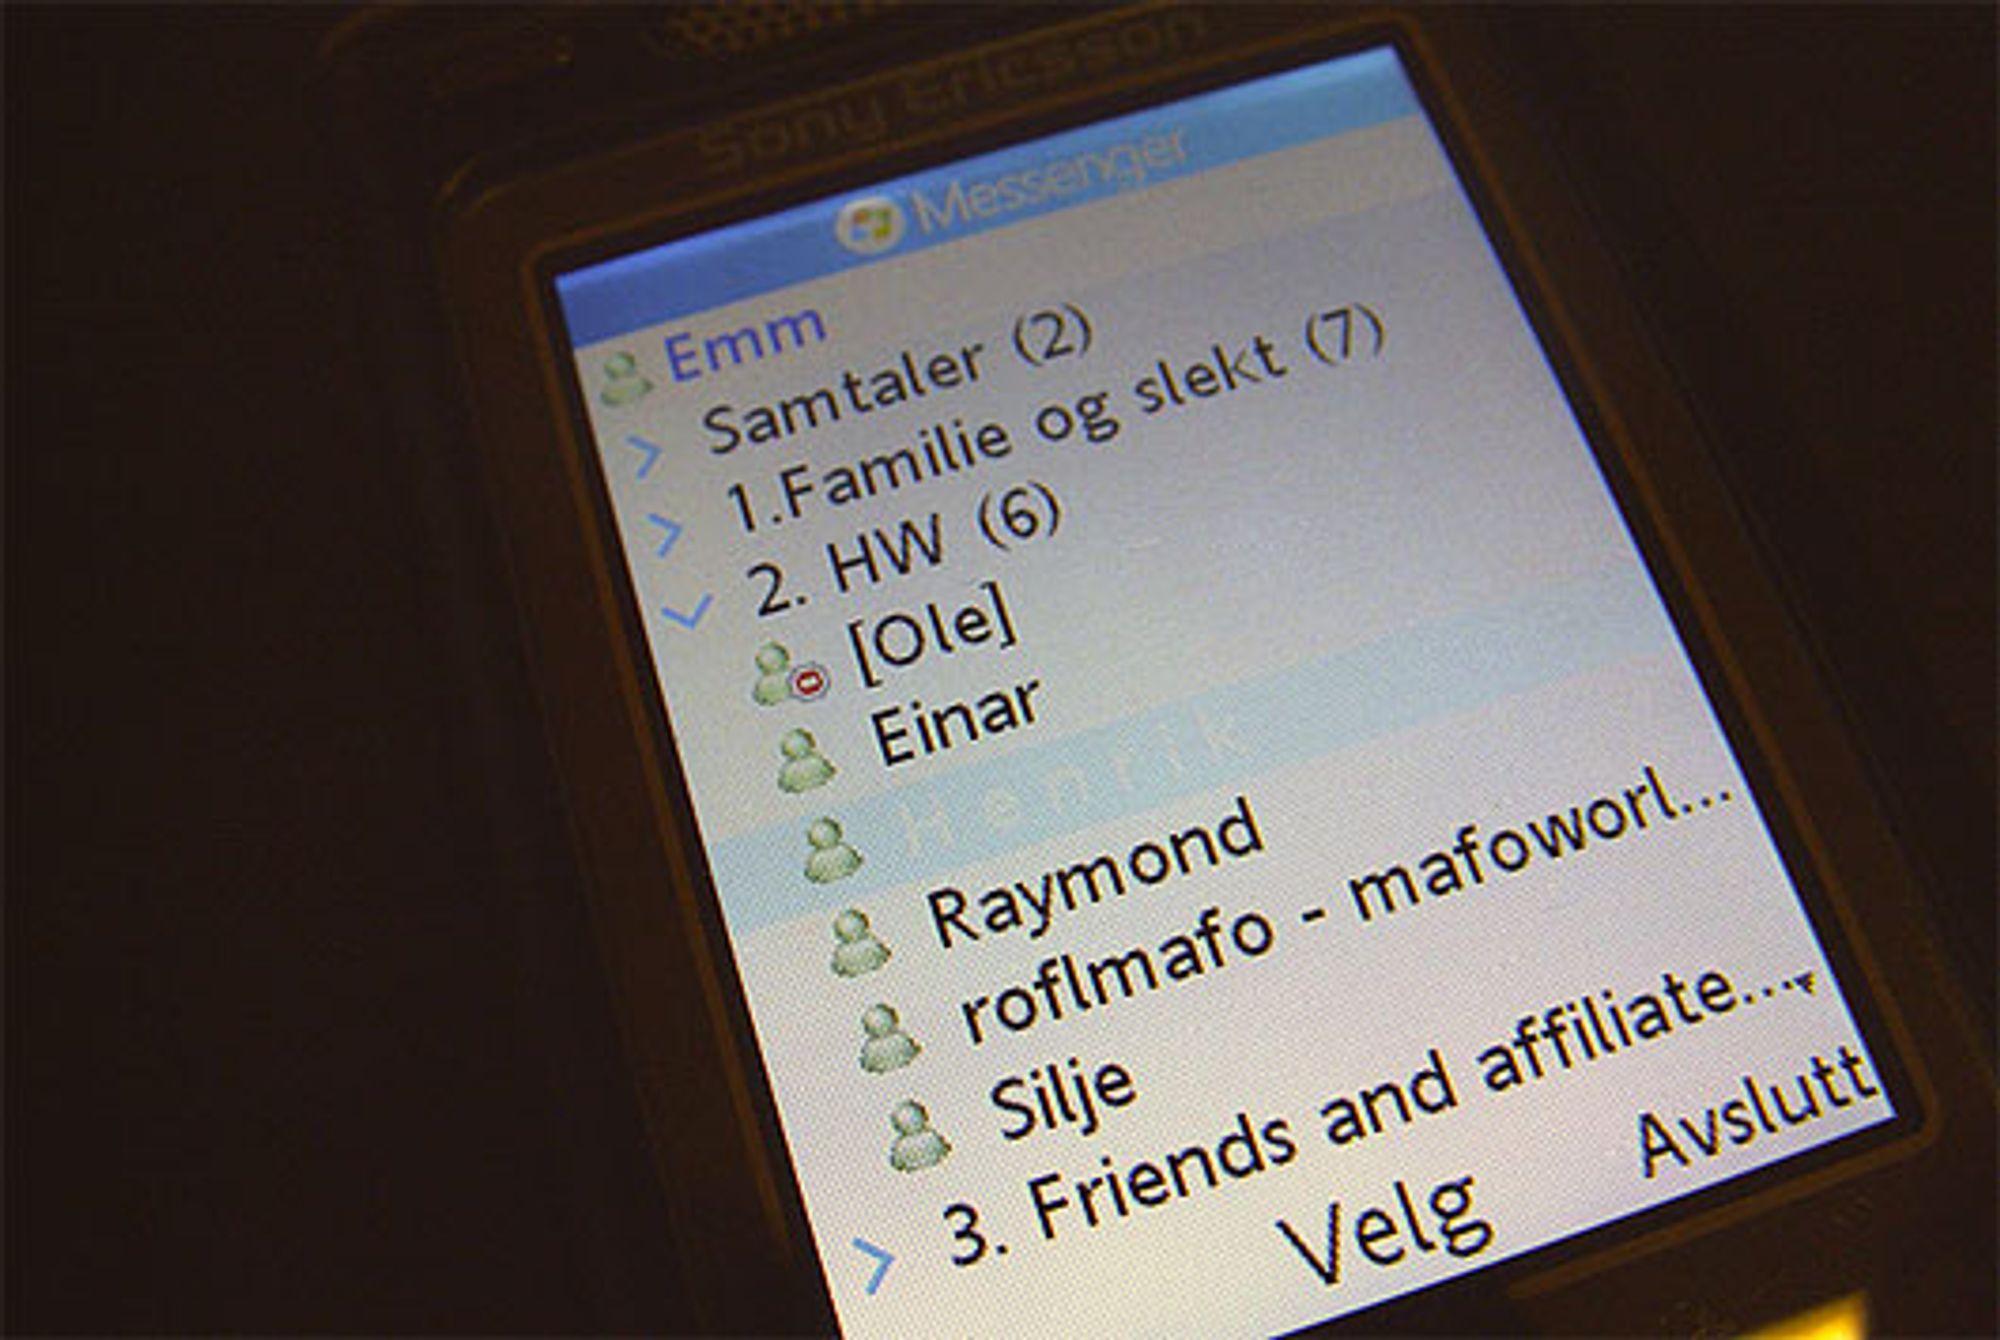 Telenors MSN-klient. (Foto: Marius Valle)